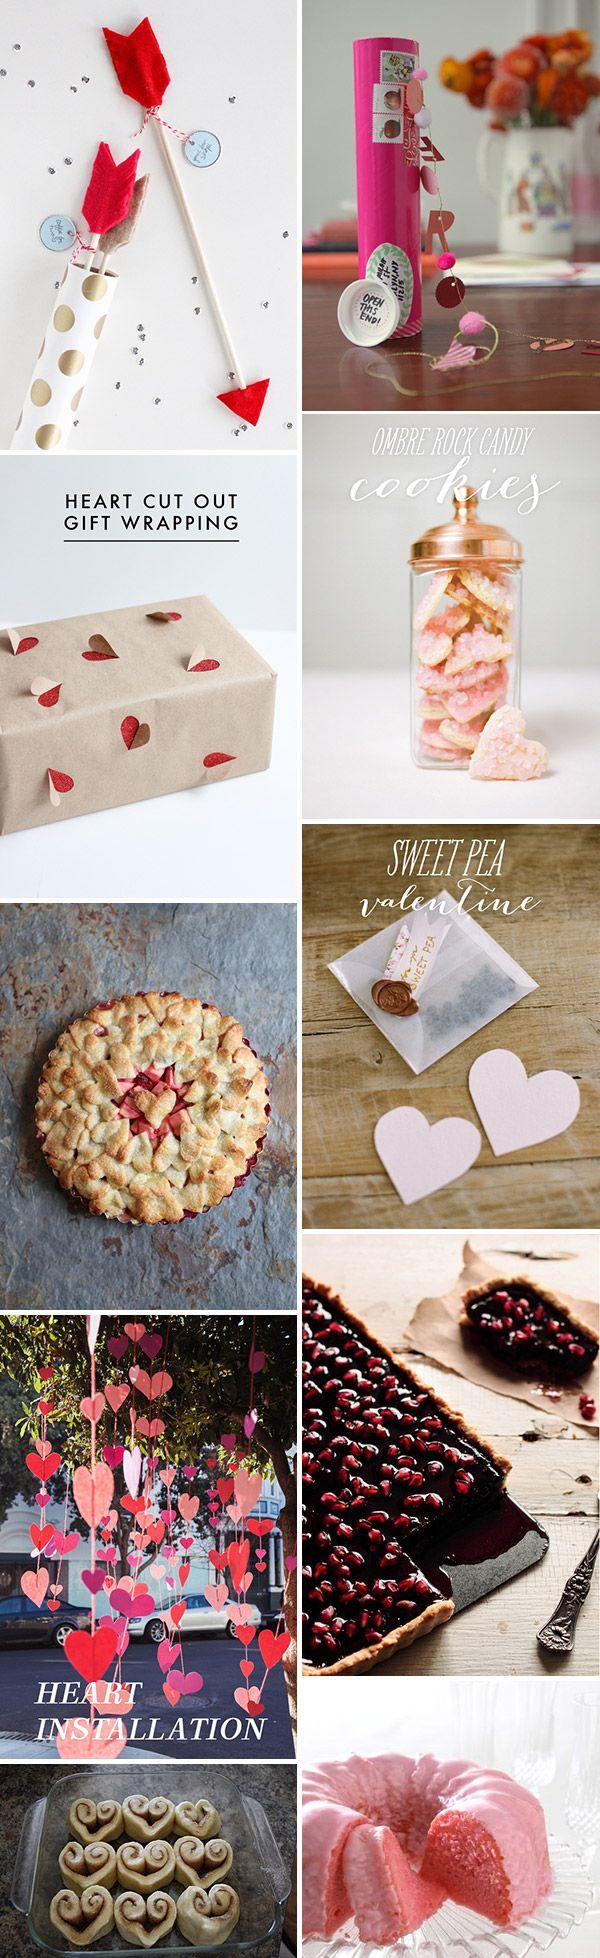 Valentines-DIY-roundup- each one so pretty! #valentinesday #heart #diyvalentine